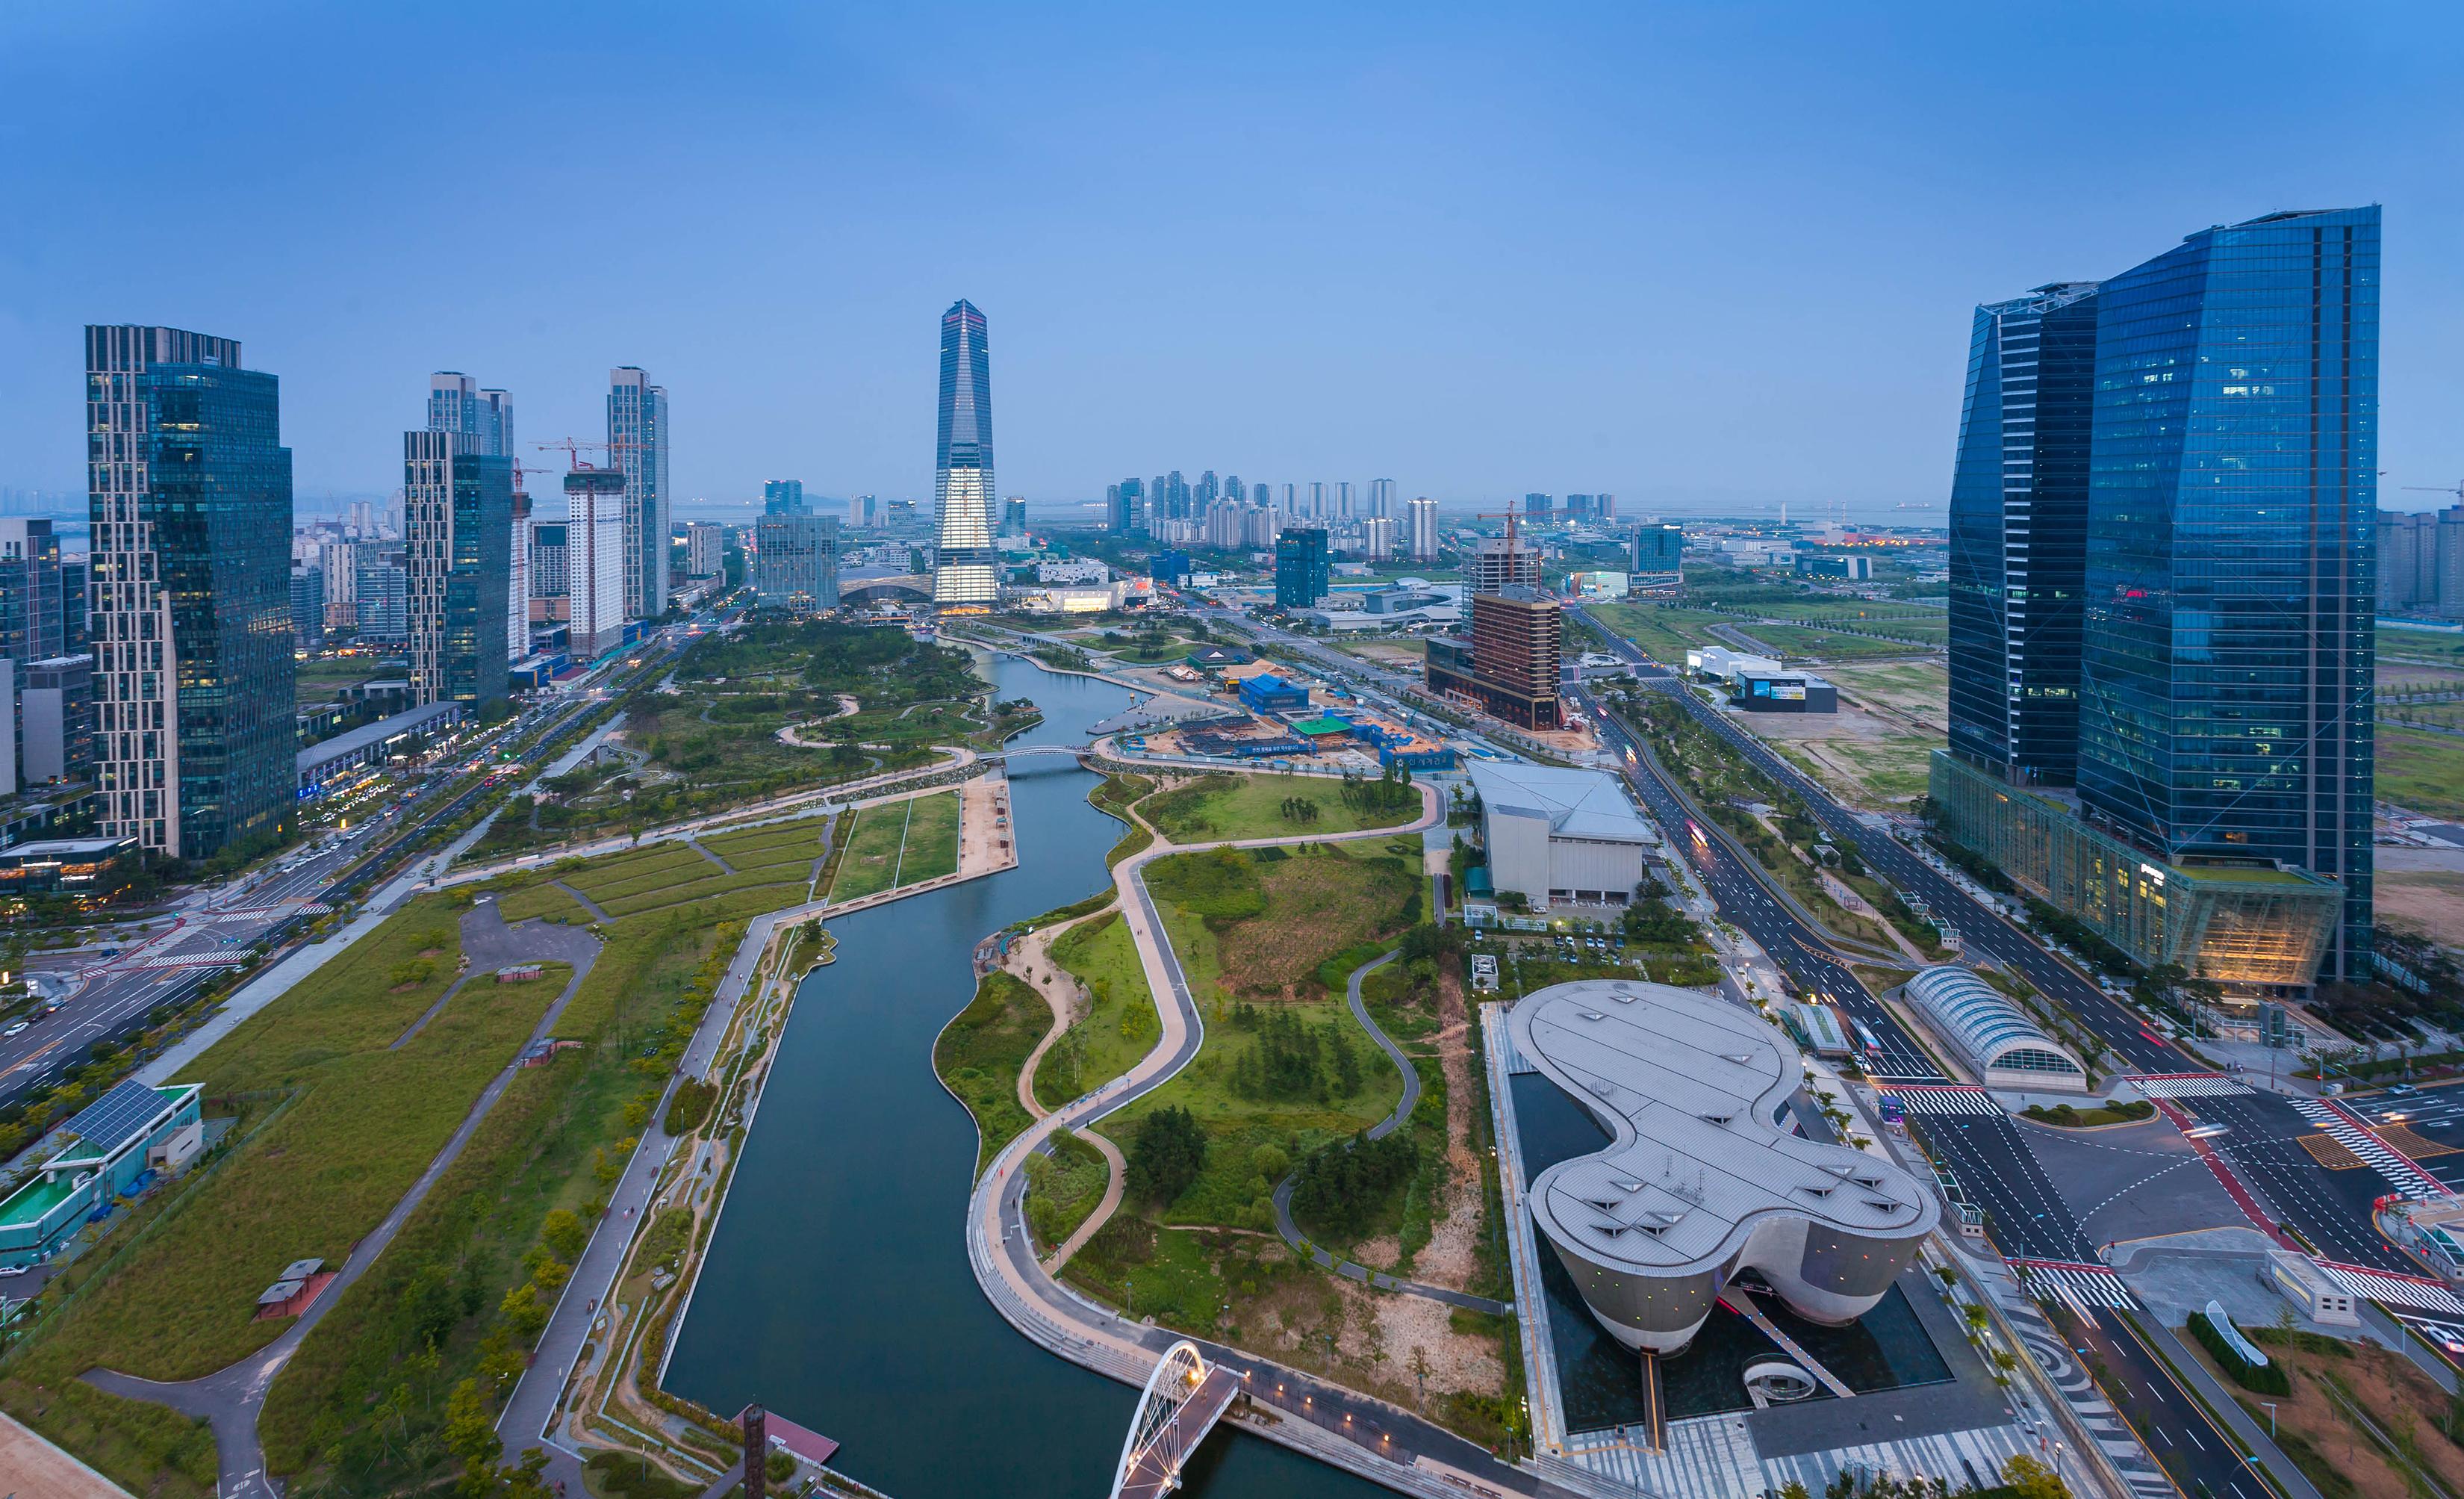 South Korea's smart cities getting smarter - Asia Property Awards